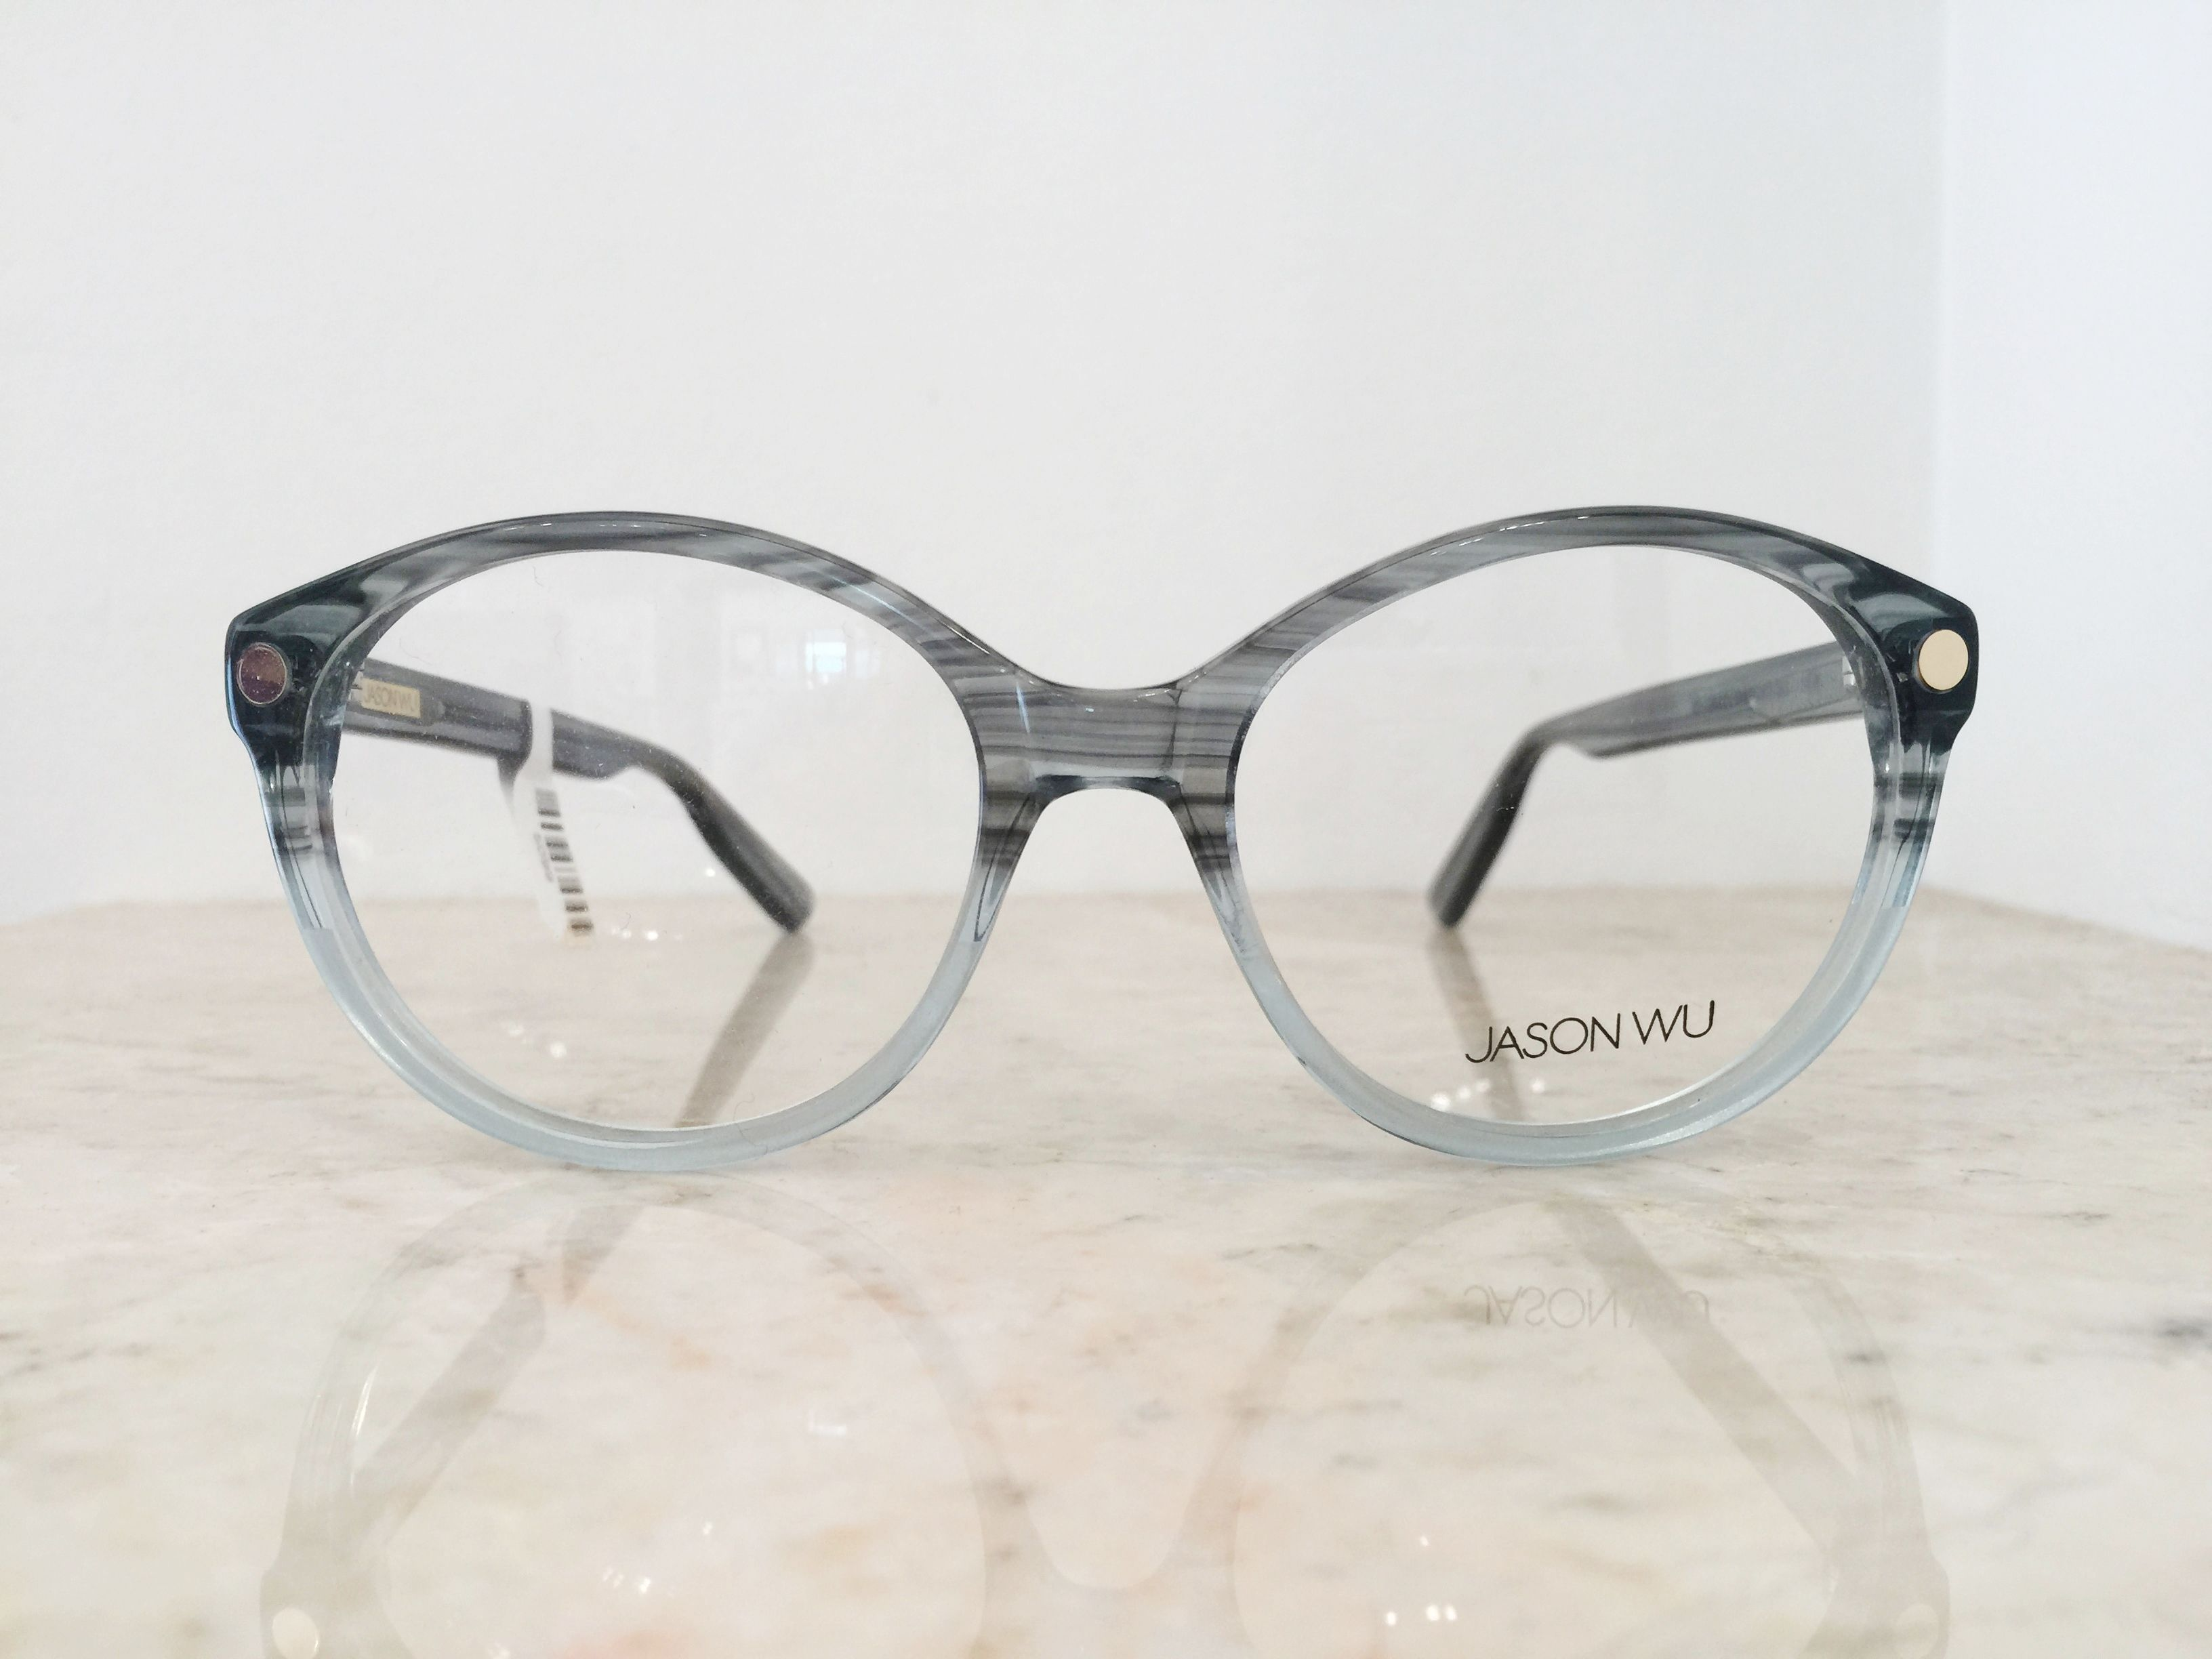 53827a4c8e7d Jason Wu blue grey two-tone  hipster round glasses frames